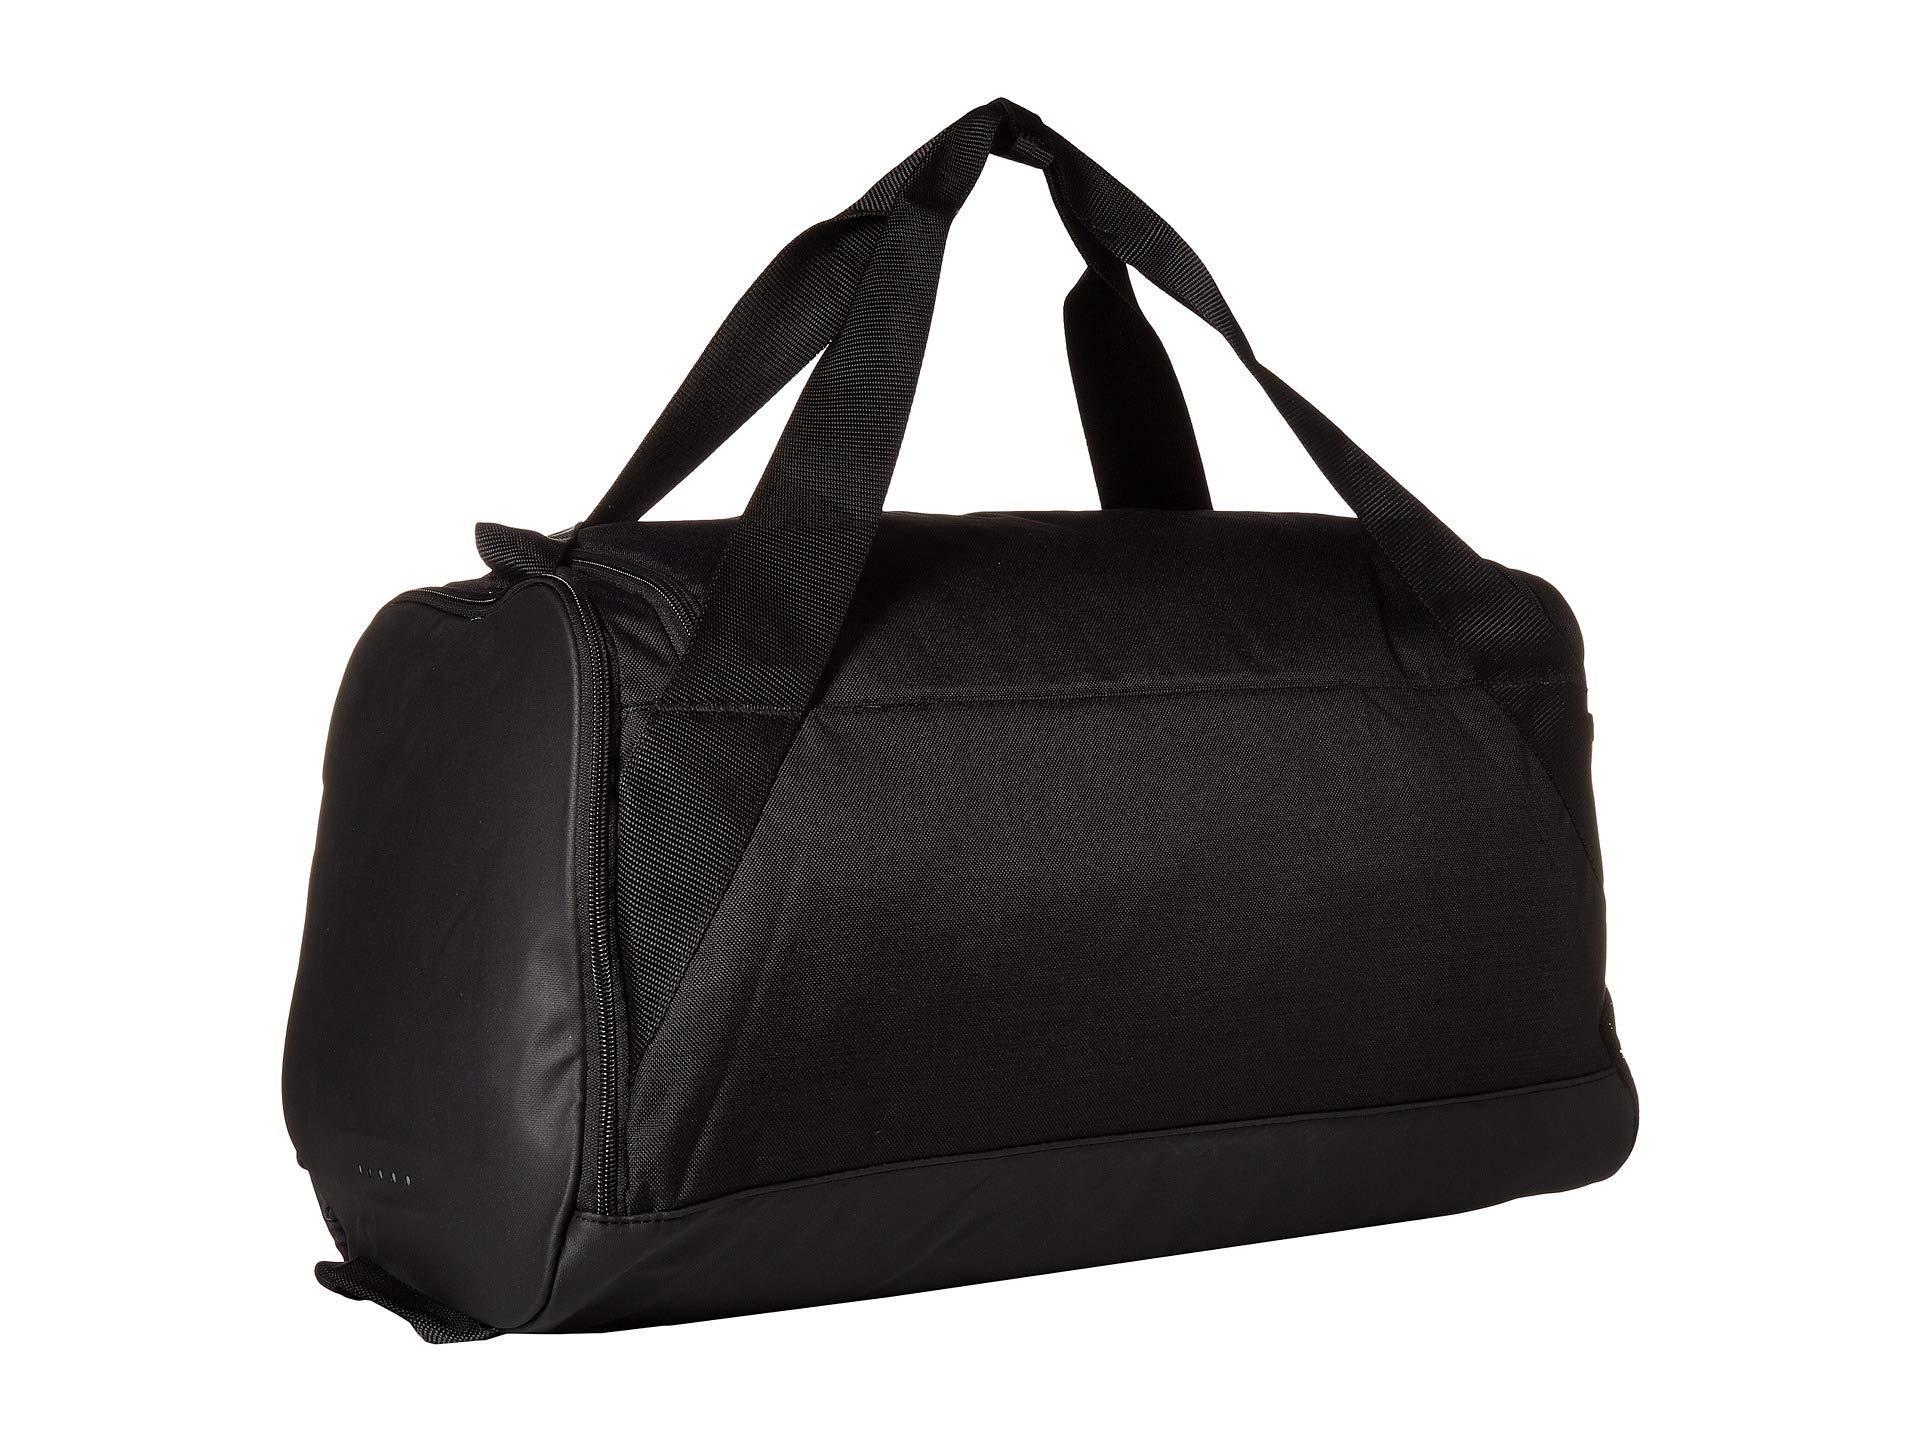 46a62c0e3b Nike - Brasilia Small Training Duffel Bag (green Abyss black white) Duffel.  View fullscreen